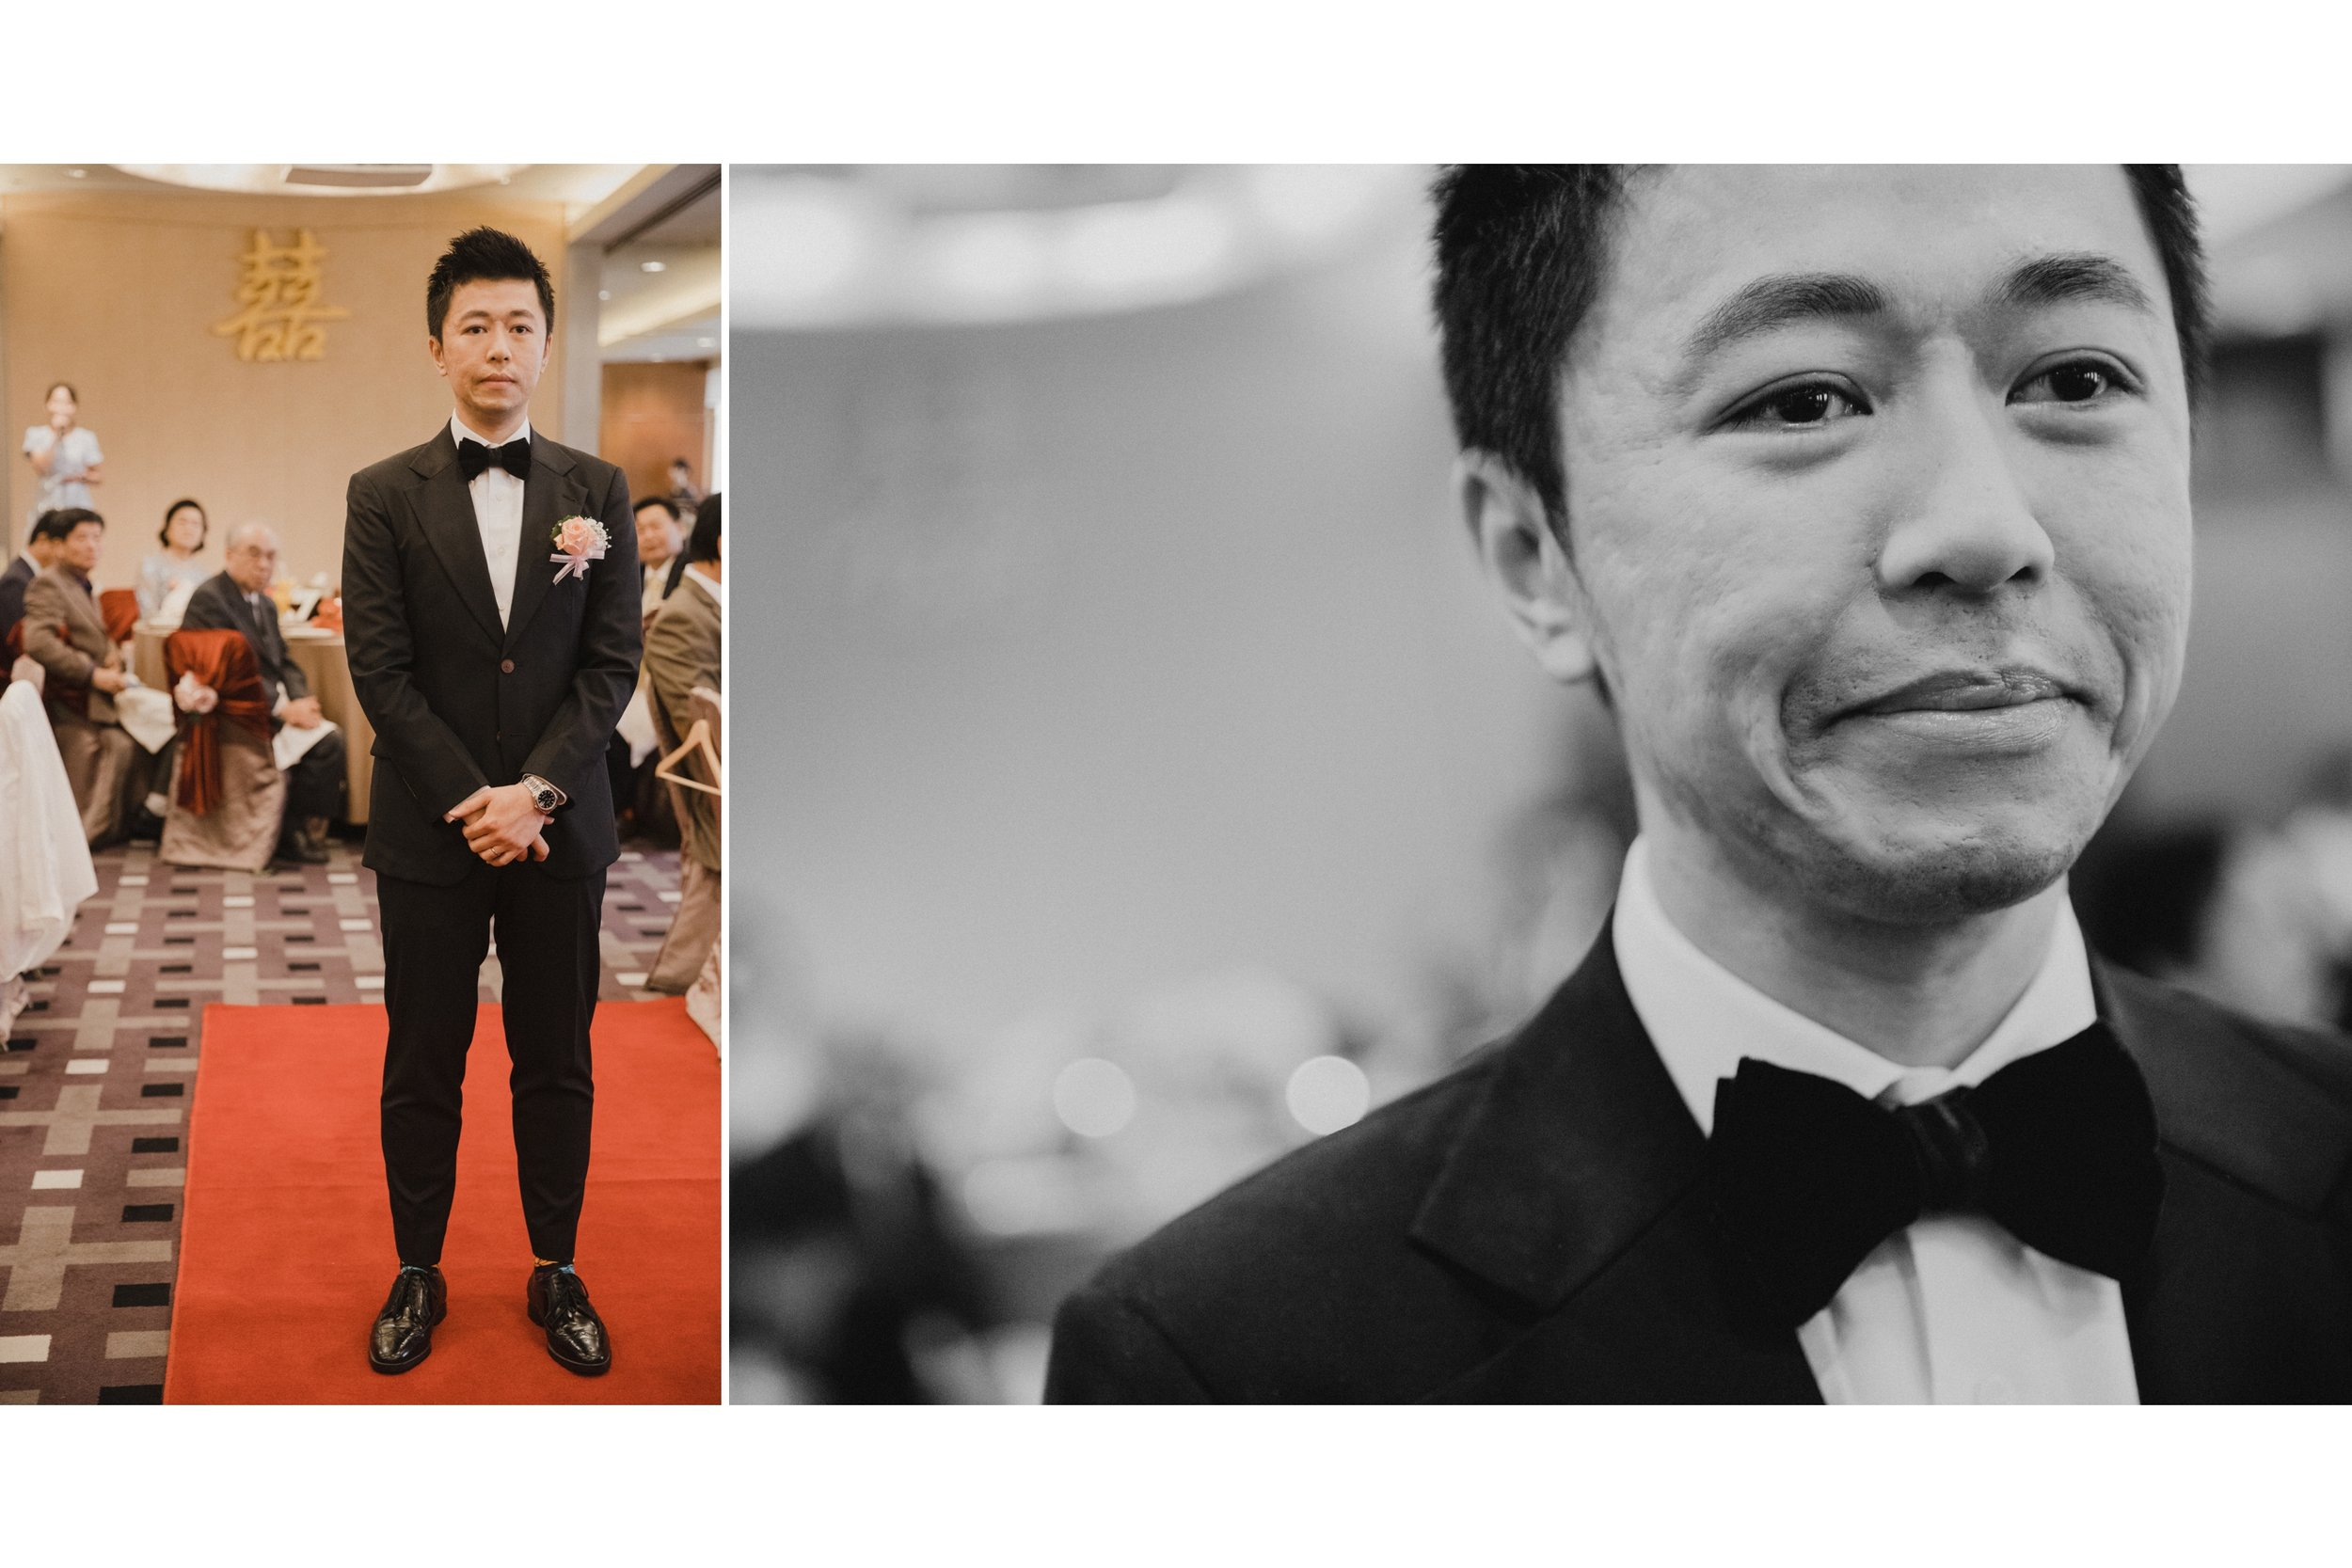 wedding-caridee-oscar-lunch-ambassador-hsinchu-結婚午宴-新竹國賓_60.jpg